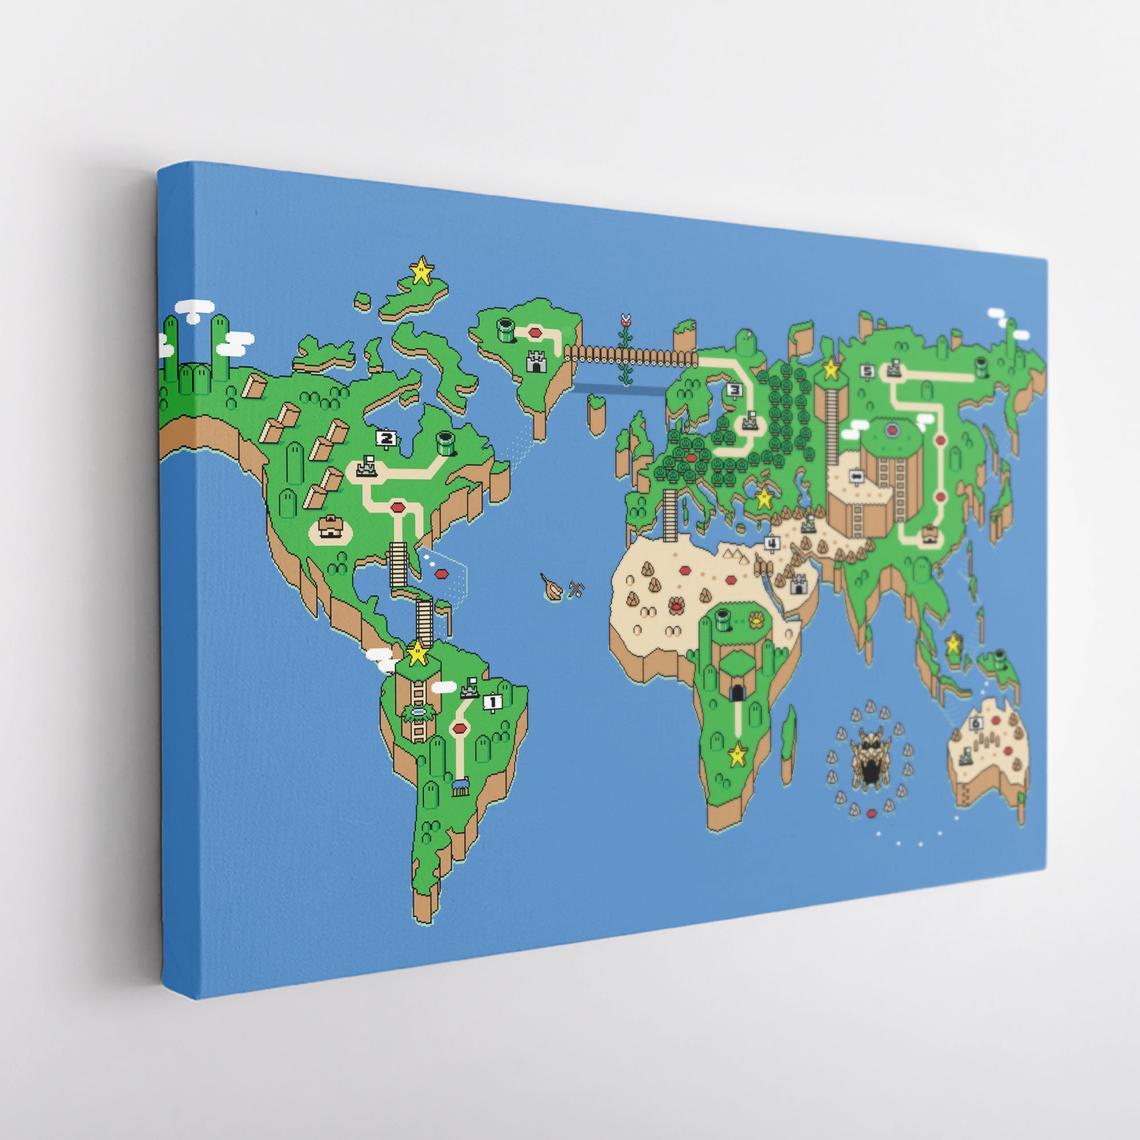 Super Mario World Map Canvas Wall Art